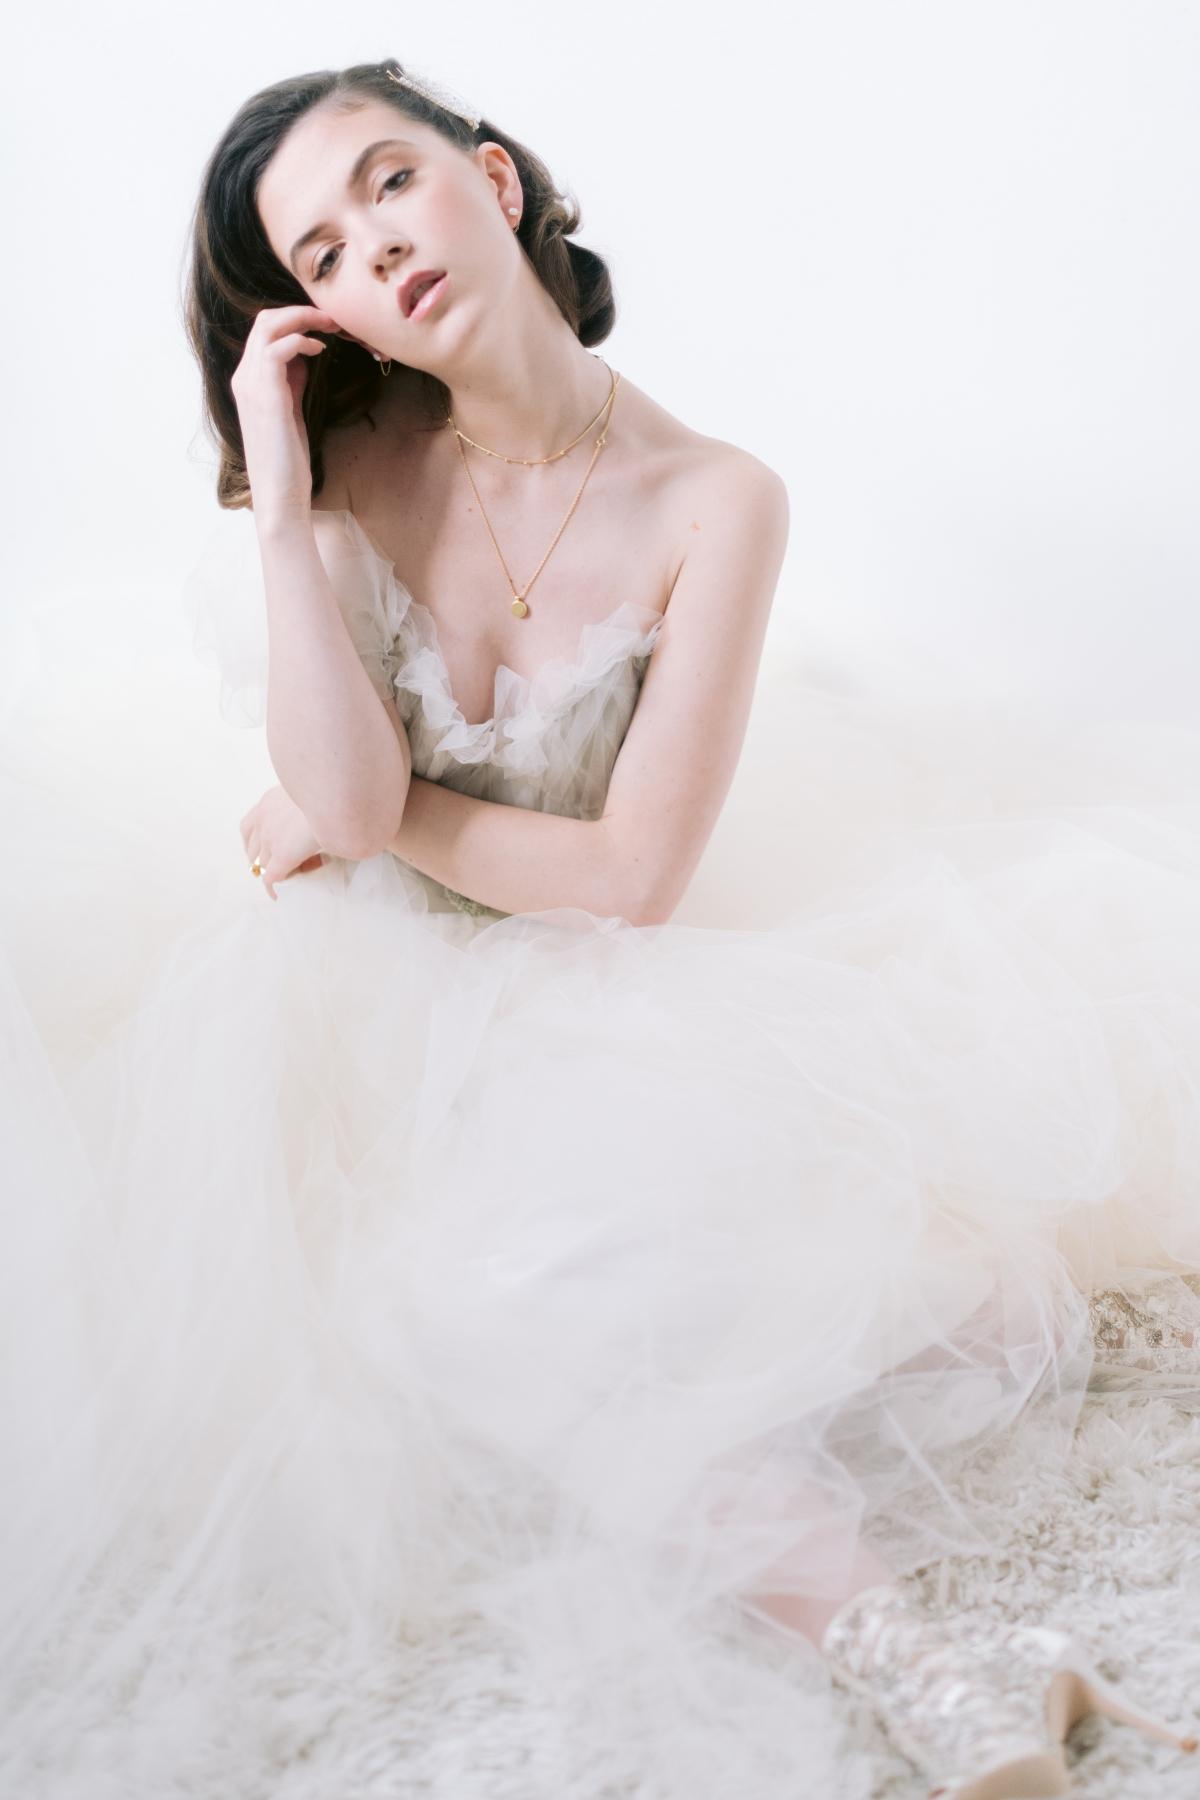 Laura Lanzerotte Bridal Danielle Heinson Photography 46